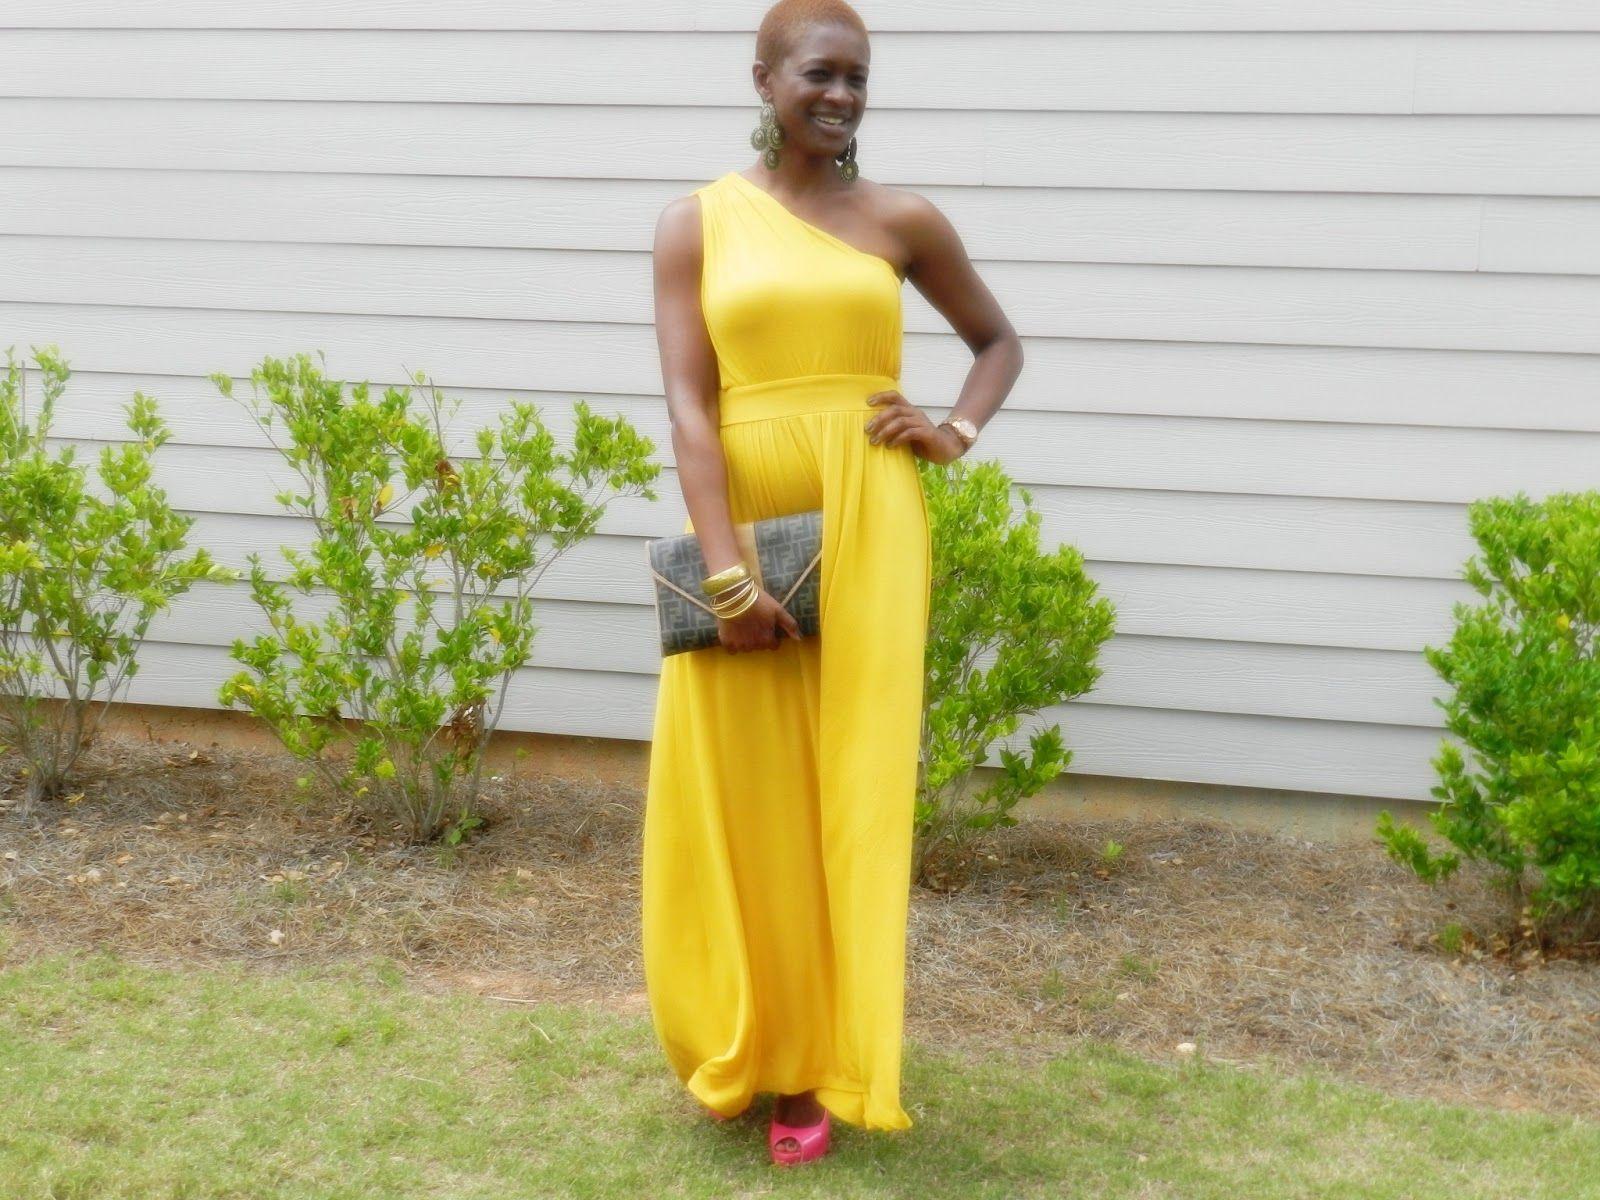 Black Dress Yellow Shoes Wore Maxi Dress And Earrings Funky Flair Boutique Shoes Guess Yellow Maxi Fashion Maxi Dress [ 1200 x 1600 Pixel ]